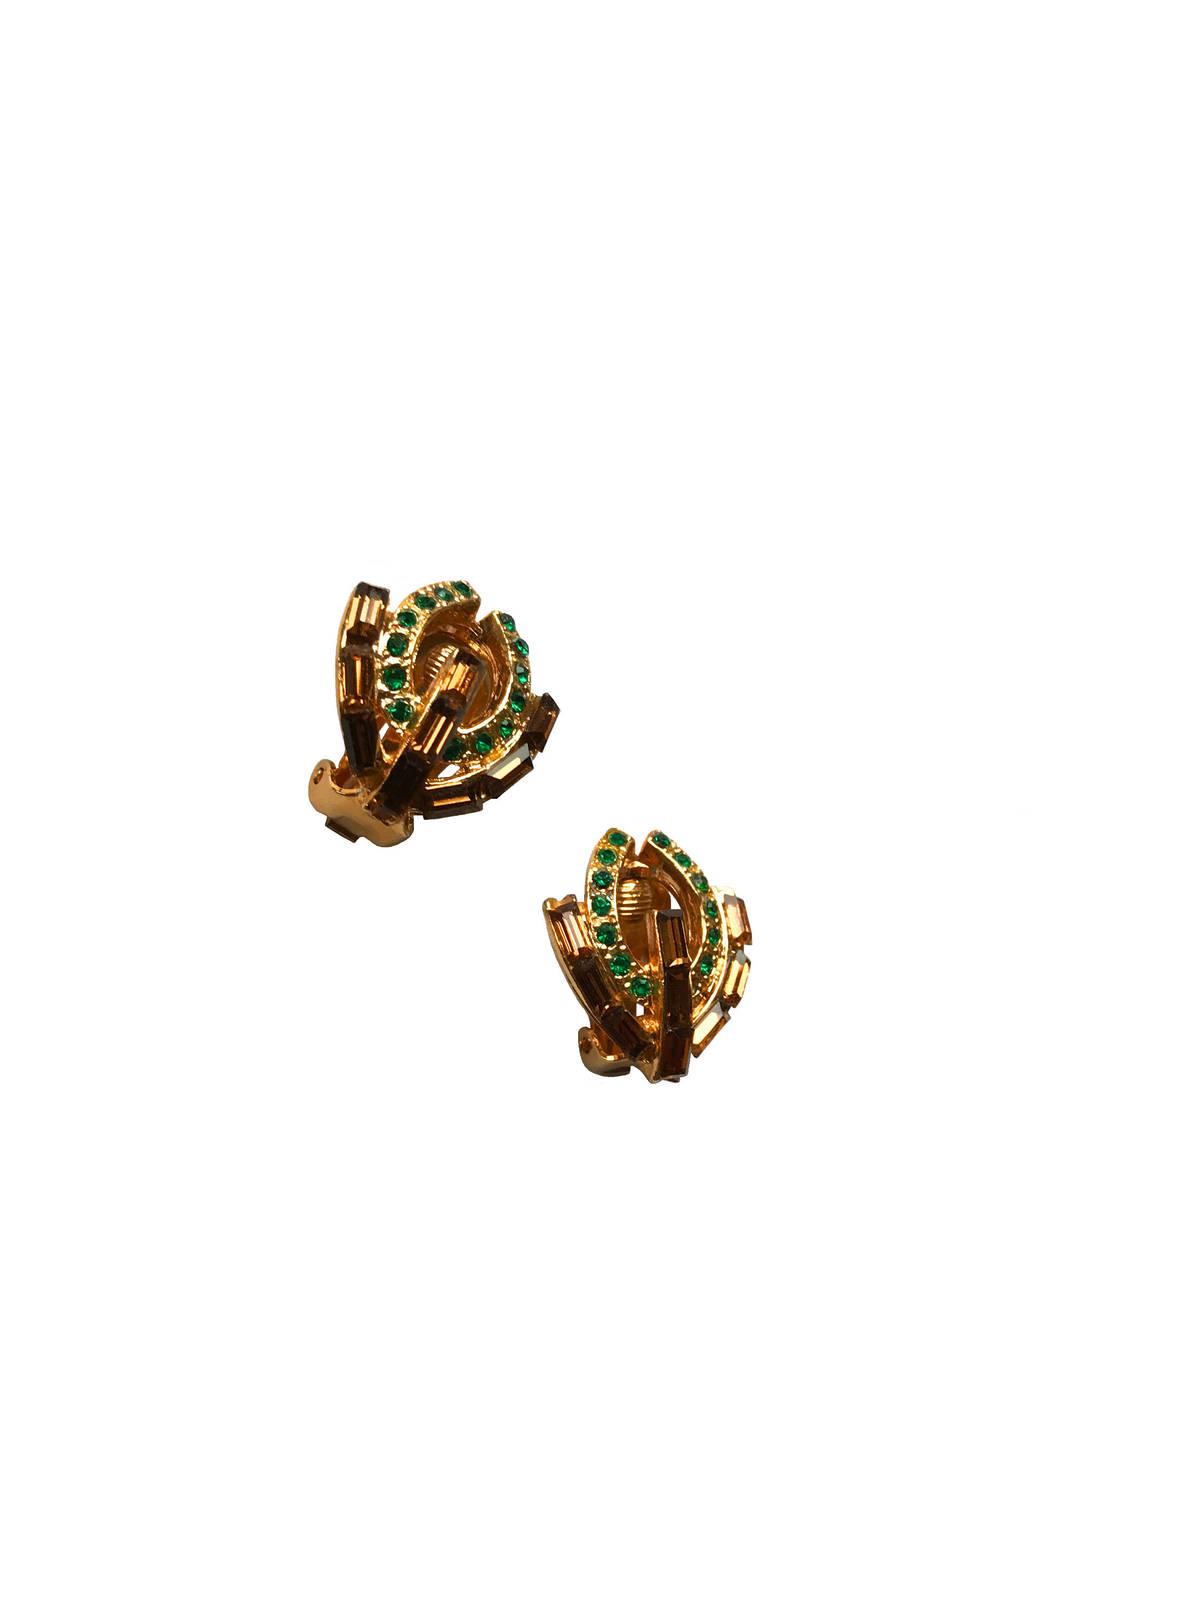 60s Amber Baguette Green Crystal Rhinestone Art Deco Vintage Clip On Earrings, W